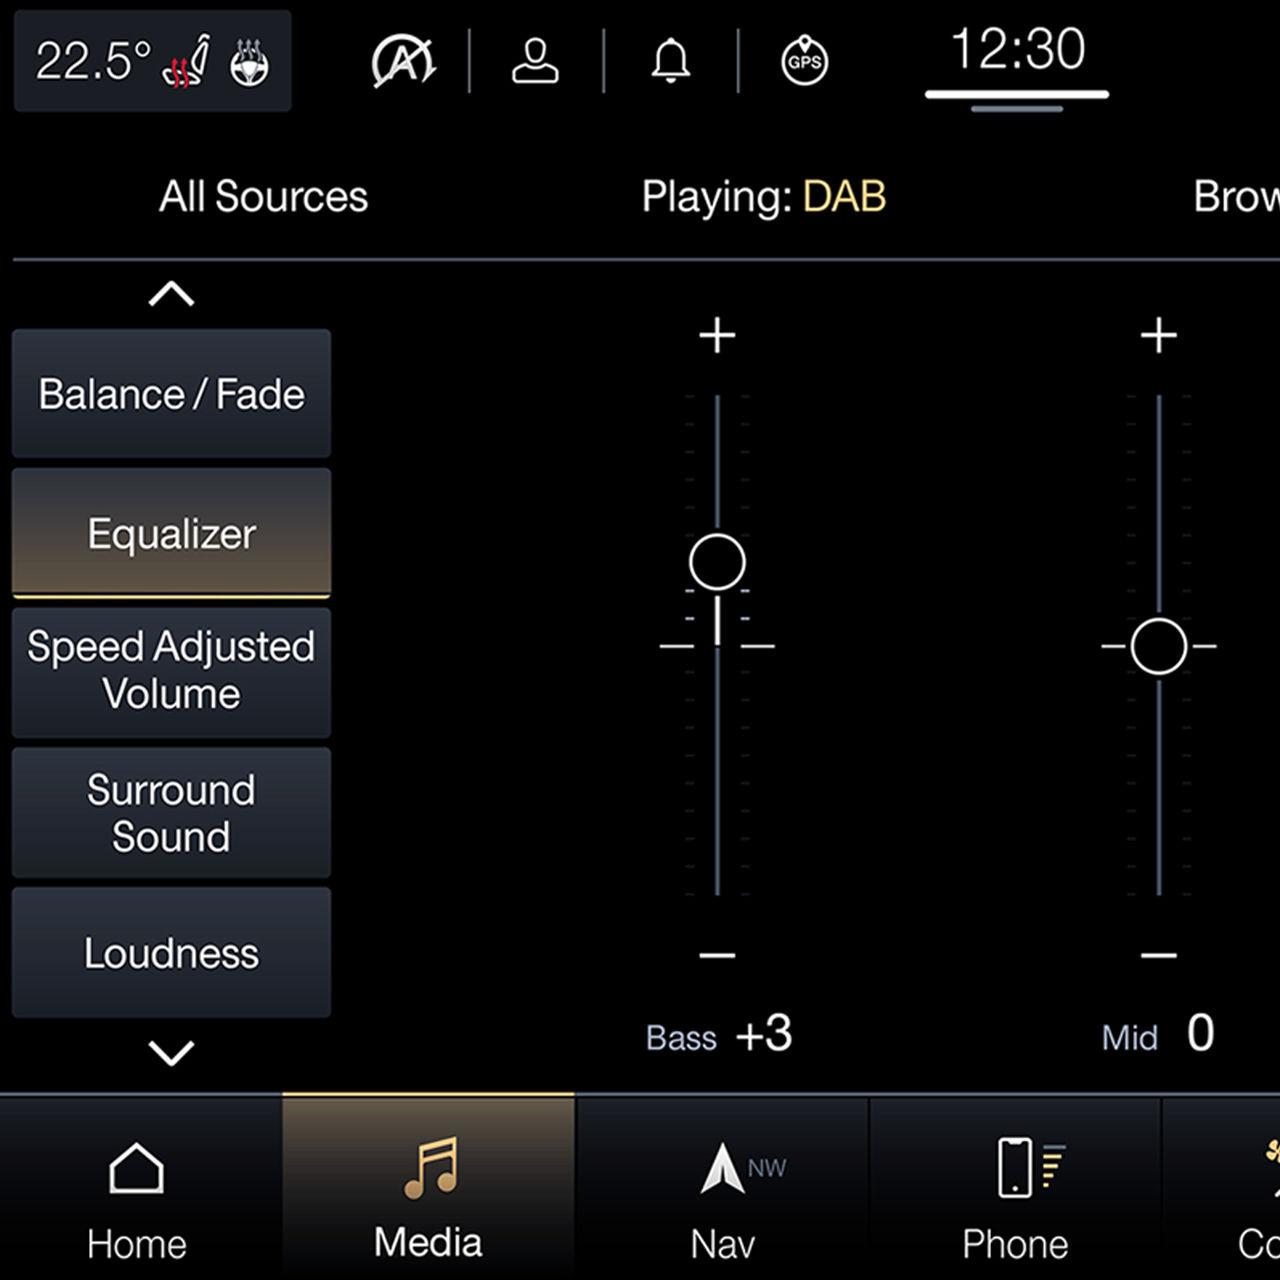 Maserati Soundsysteme Harman Kardon und Bowers & Wilkins - Playing DAB